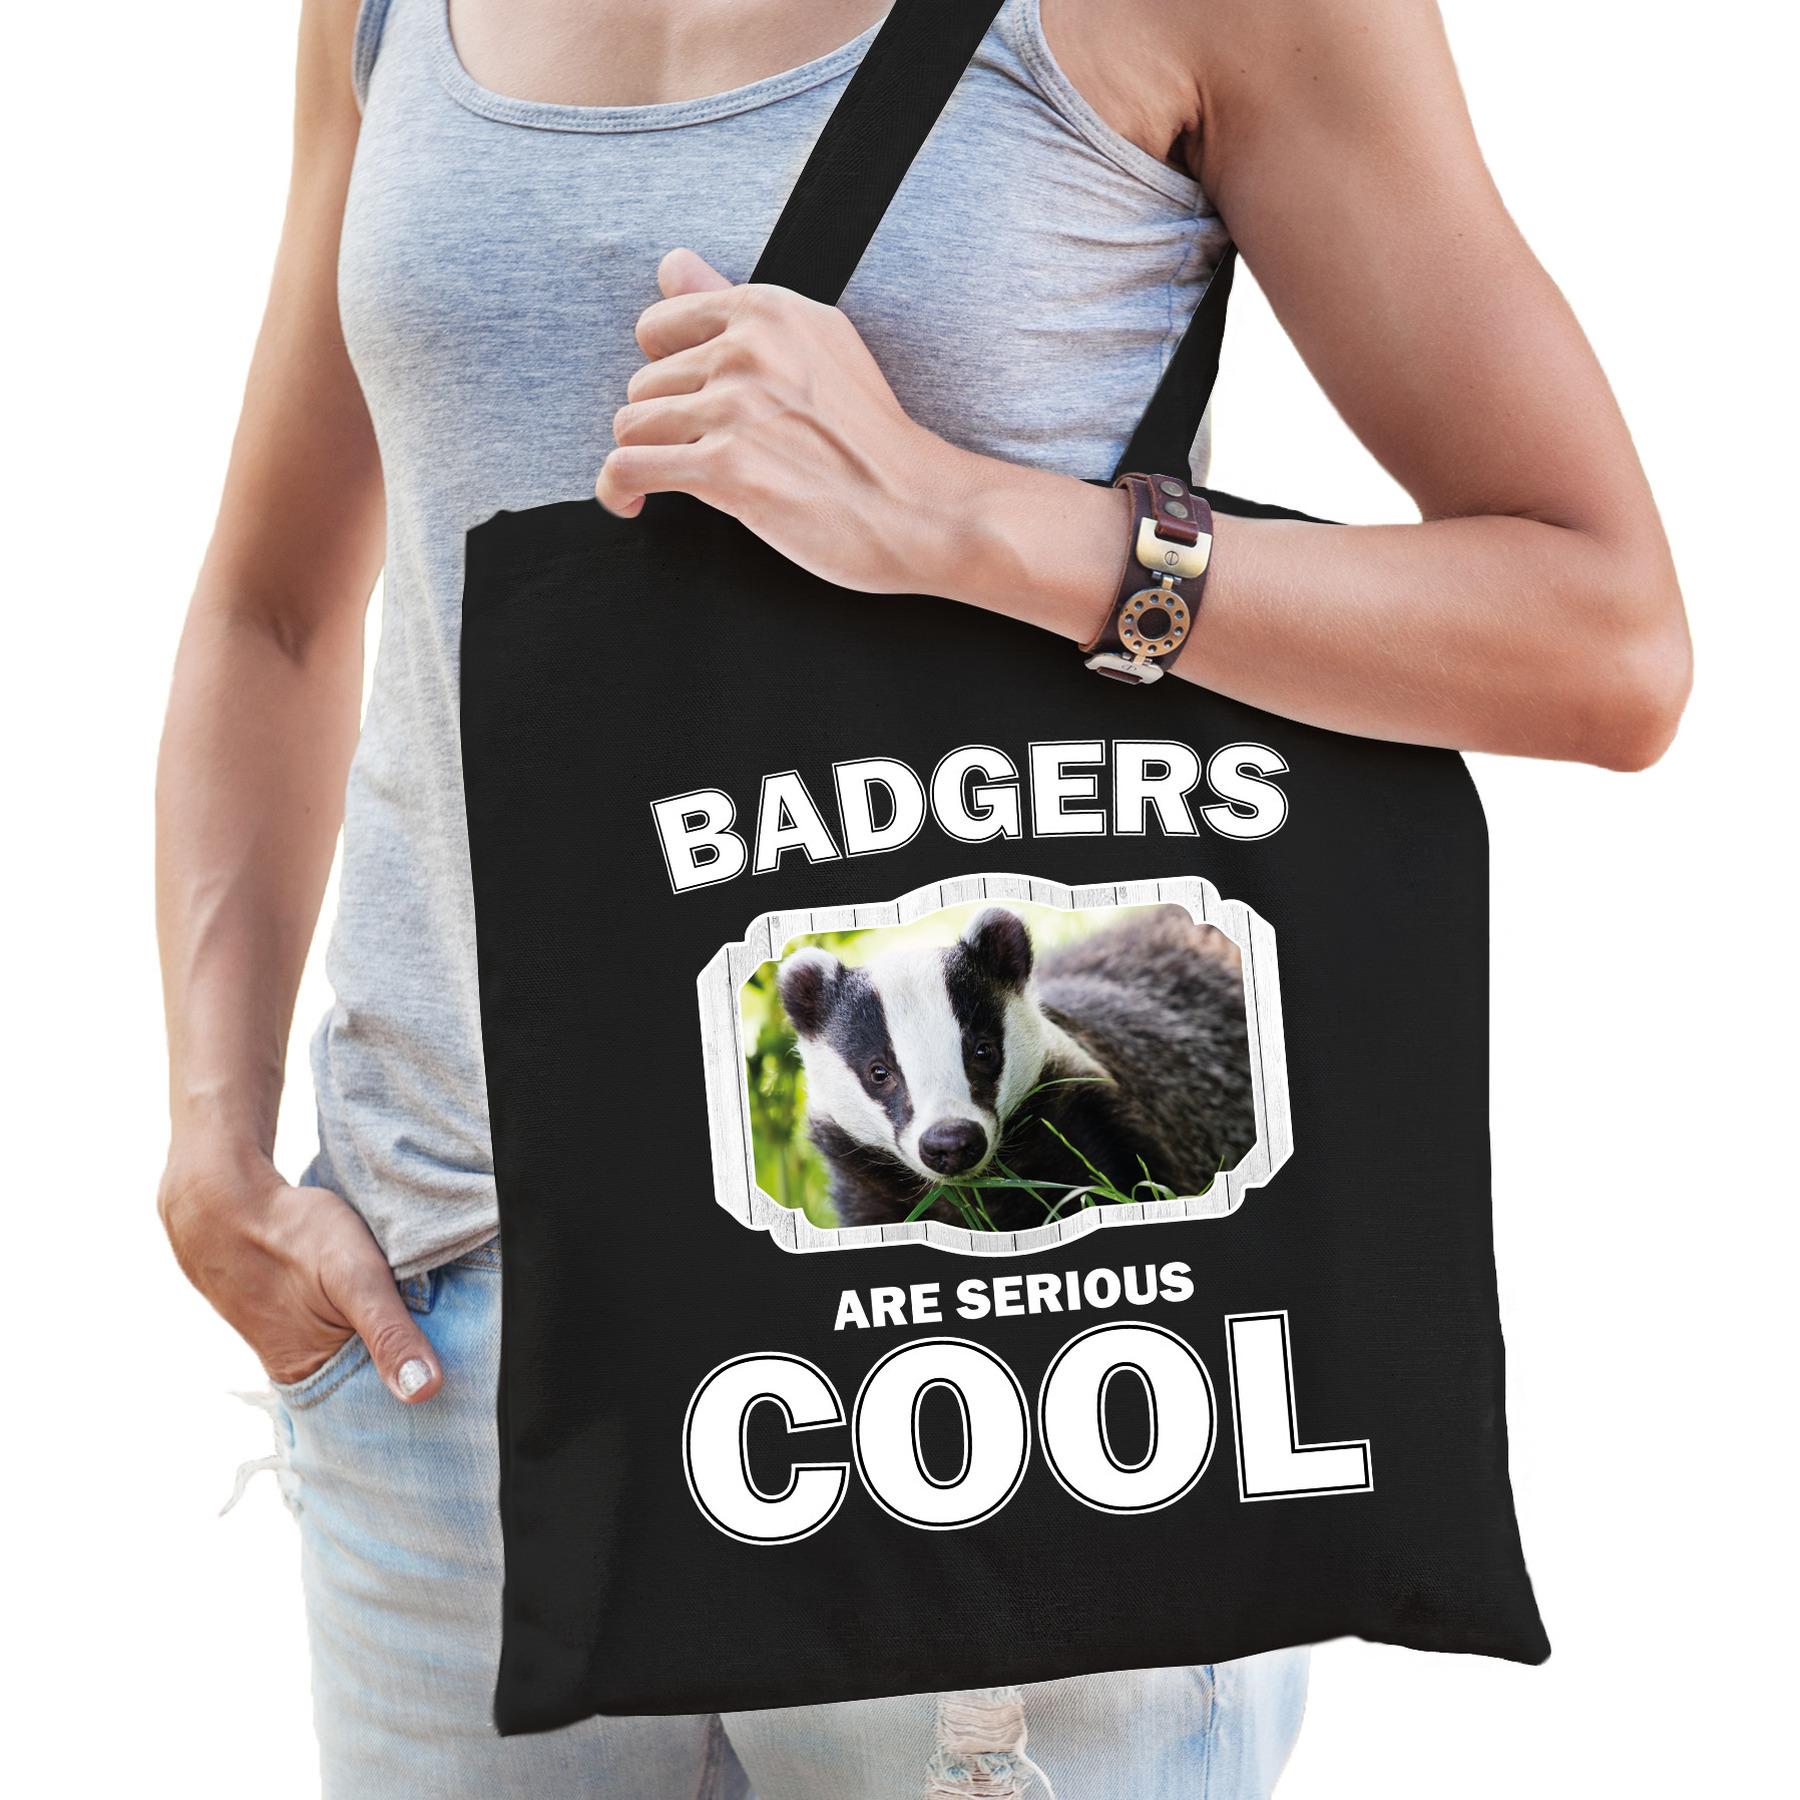 Katoenen tasje badgers are serious cool zwart - dassen/ das cadeau tas